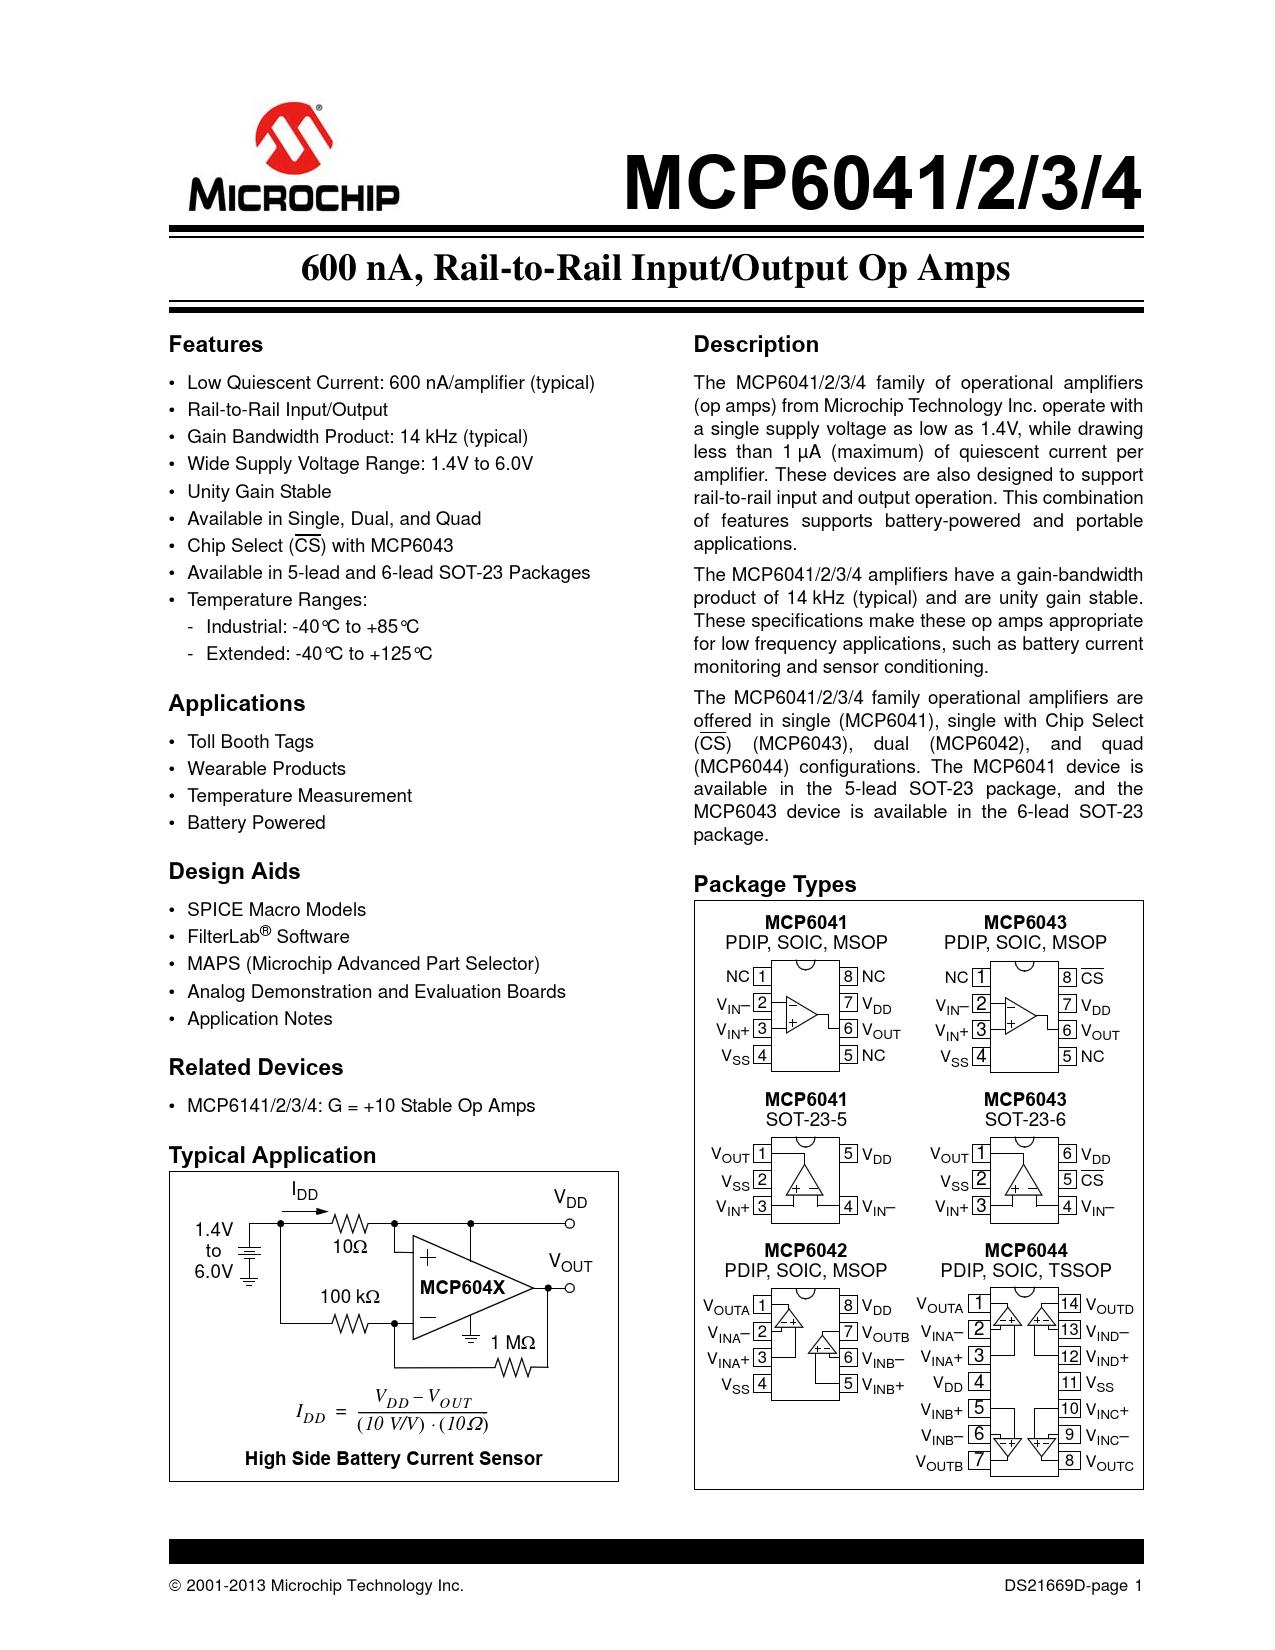 Datasheet MCP6041,  MCP6042,  MCP6043,  MCP6044 Microchip